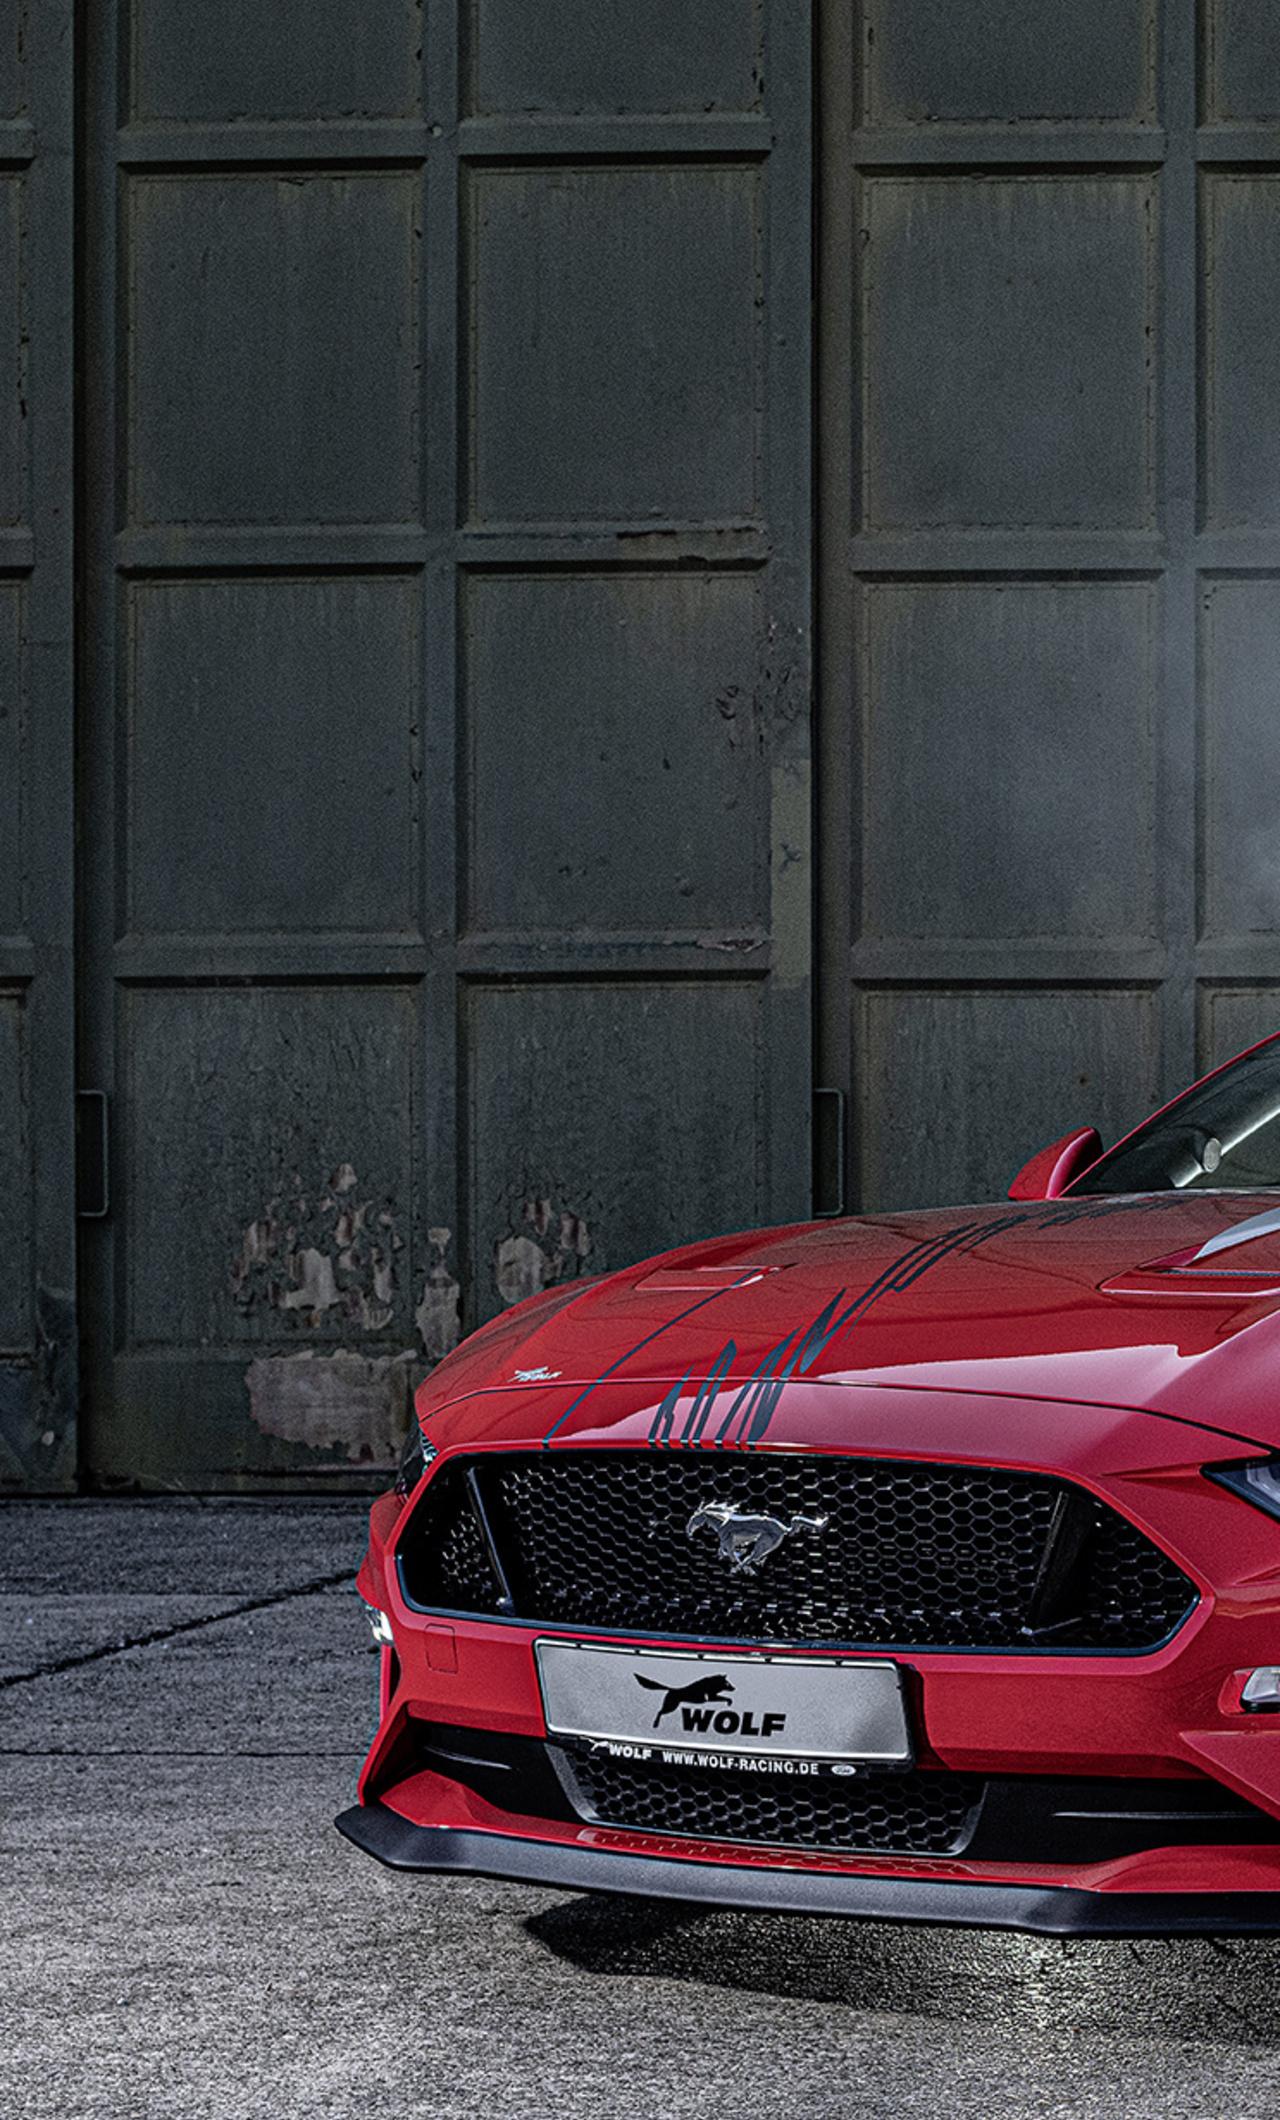 wolf-racing-ford-mustang-2019-4r.jpg